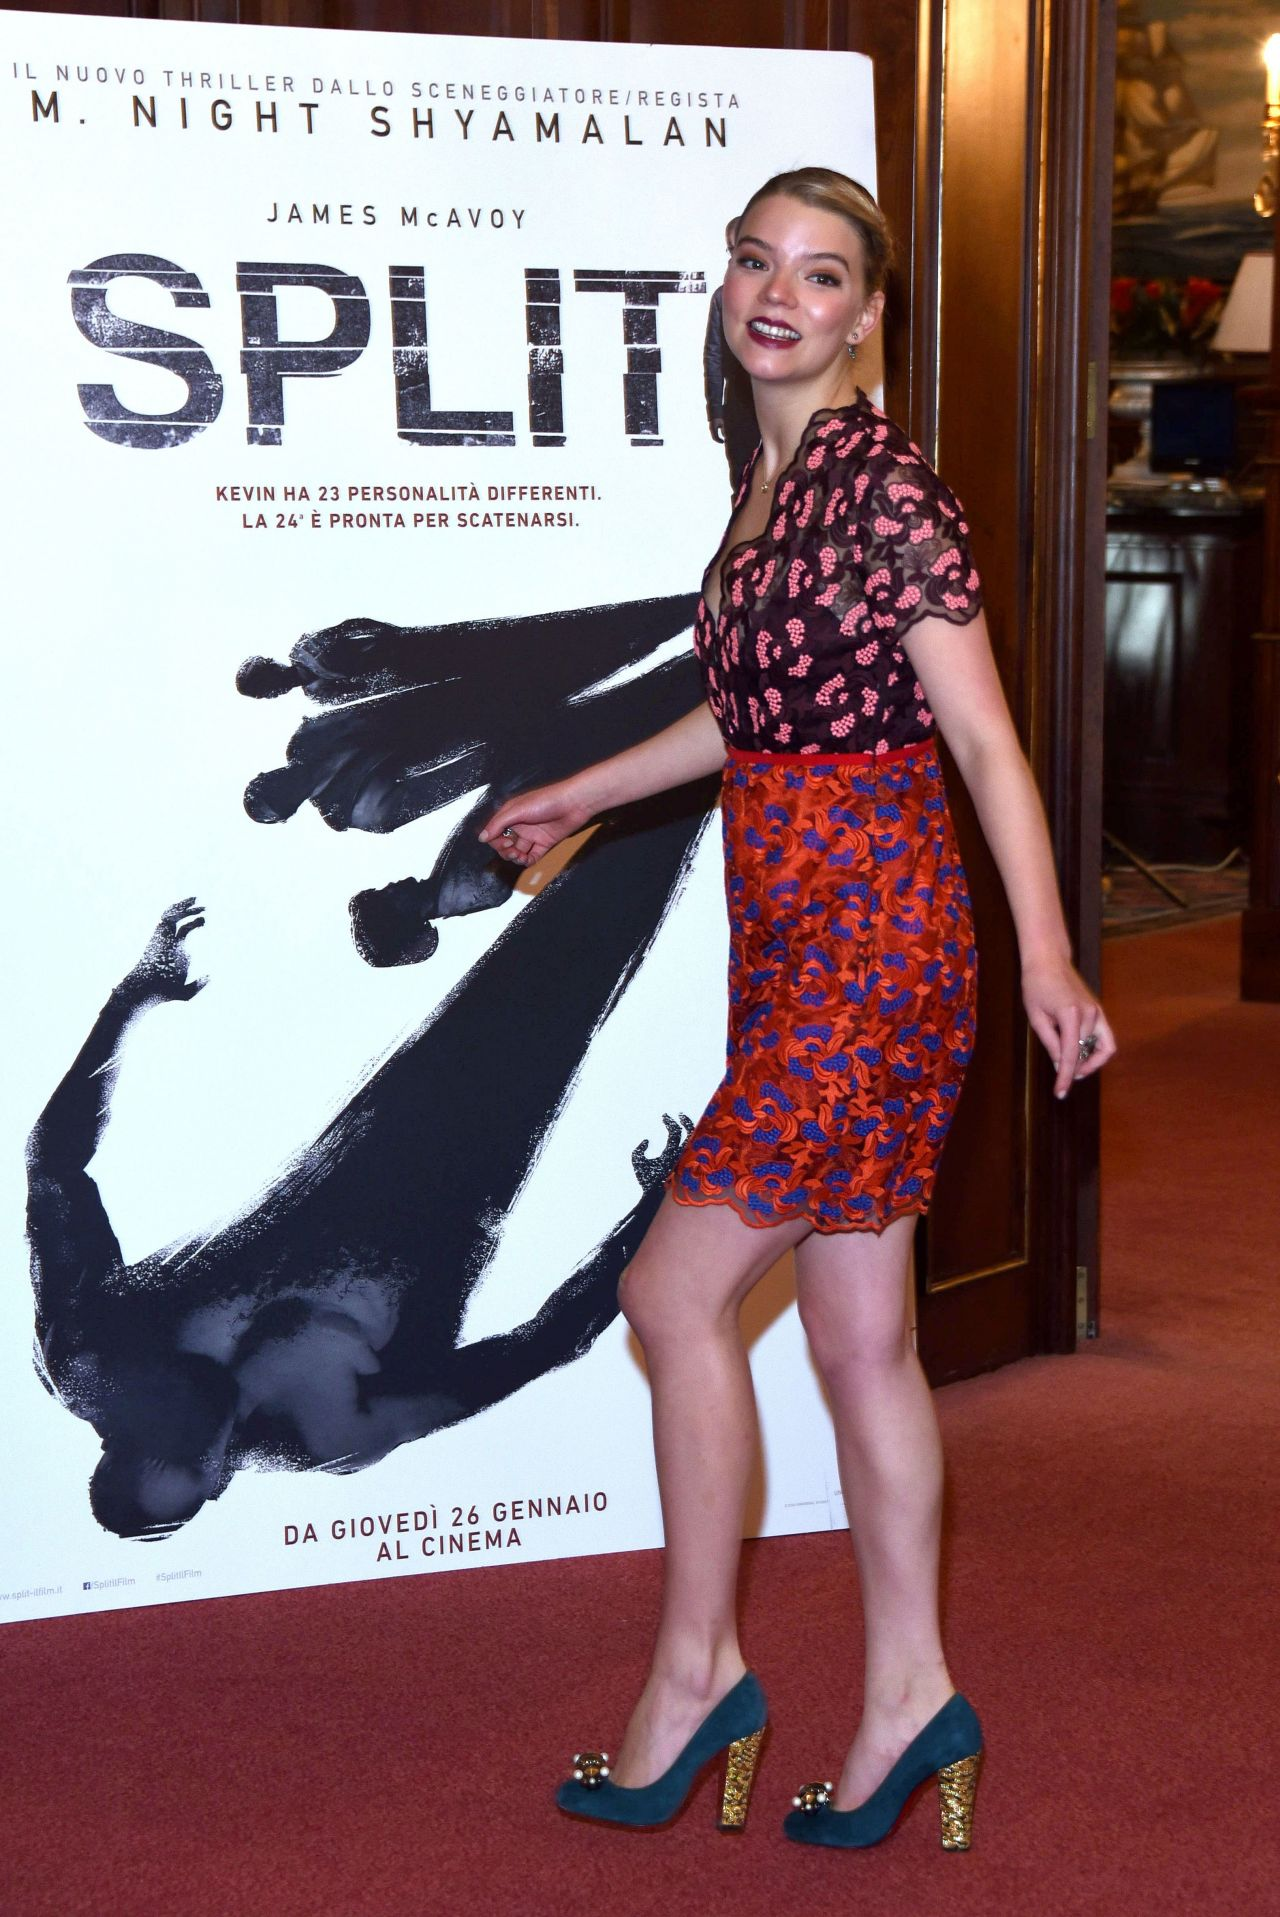 New Sienna 2019 >> Anya Taylor-Joy - 'Split' Photocall in Milan, Italy 1/11/ 2017